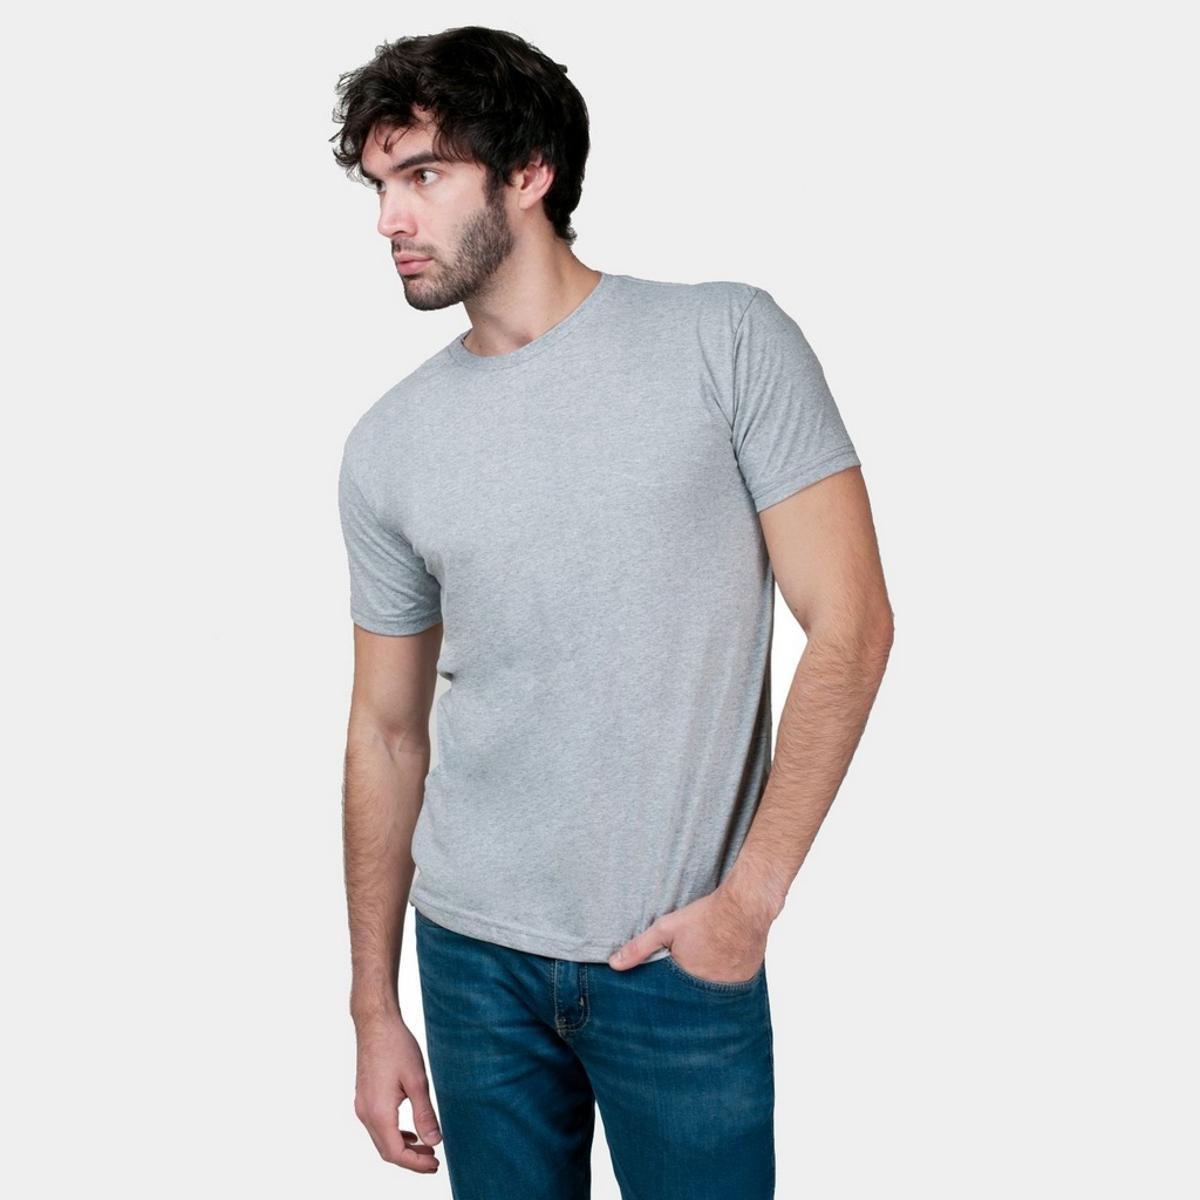 Kit 5 Camisetas Básica Masculina - Cinza